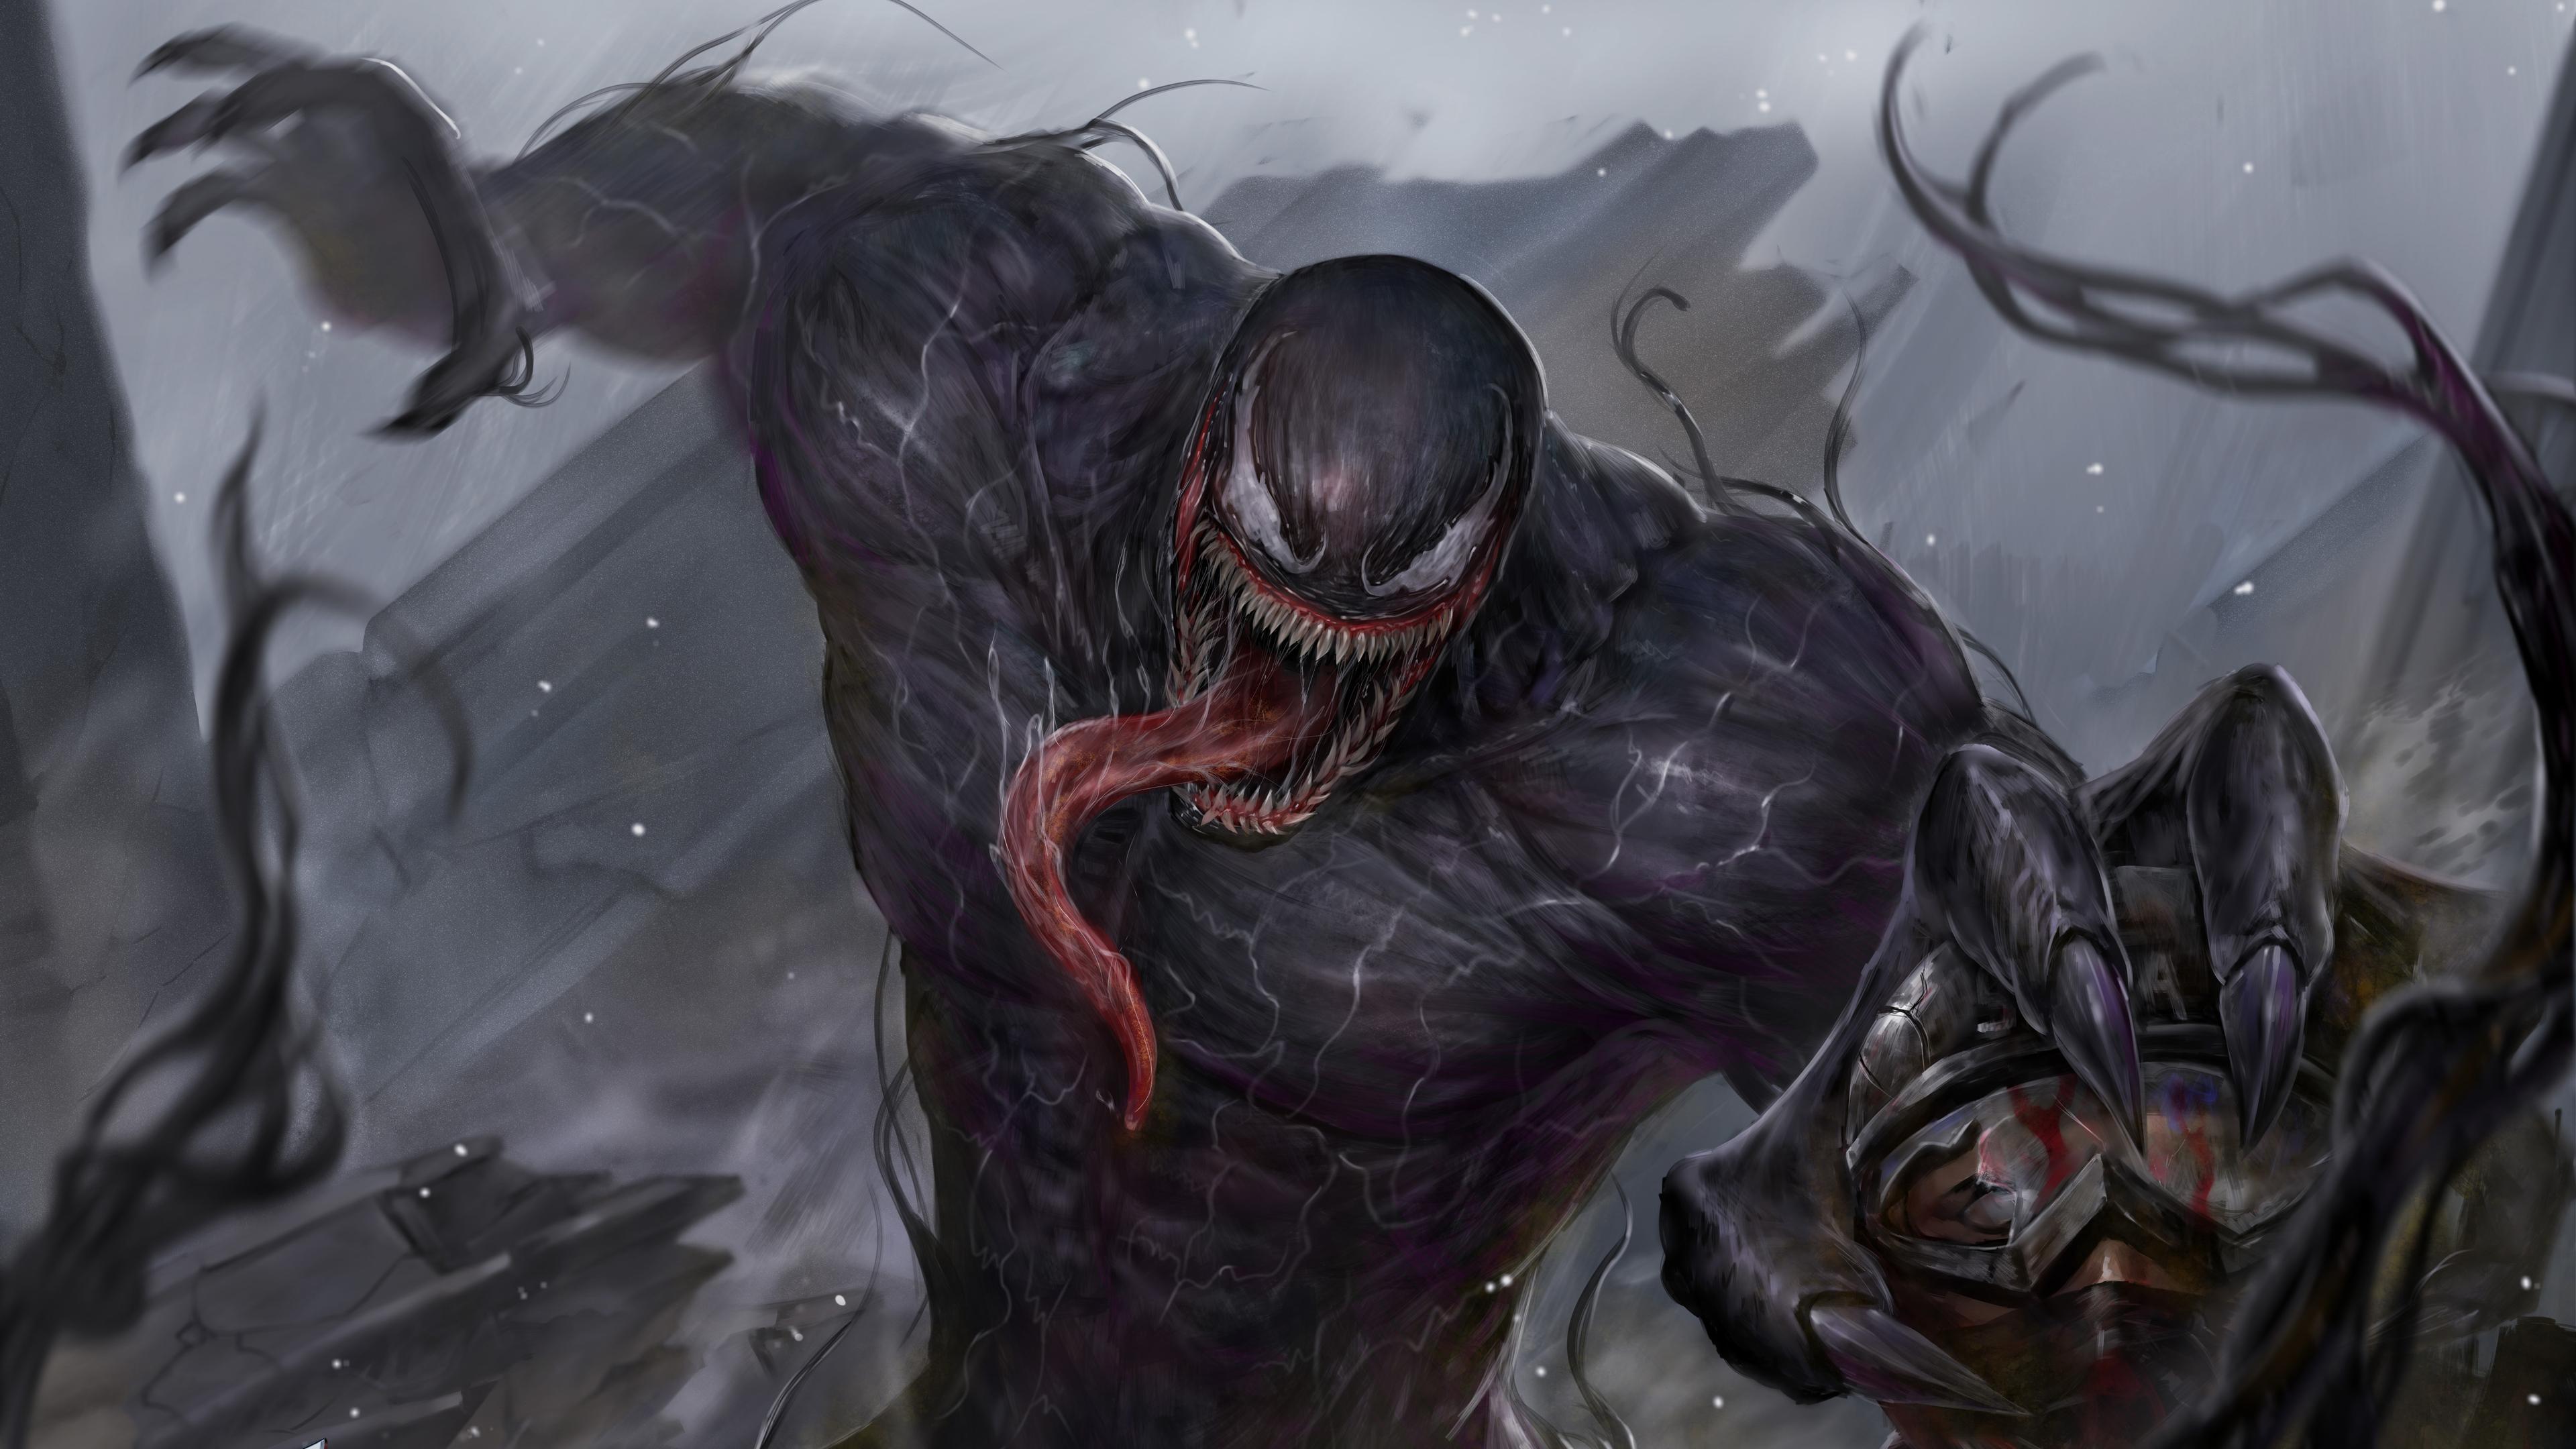 venom art 1570918554 - Venom Art - Venom wallpapers, superheroes wallpapers, hd-wallpapers, artwork wallpapers, 5k wallpapers, 4k-wallpapers